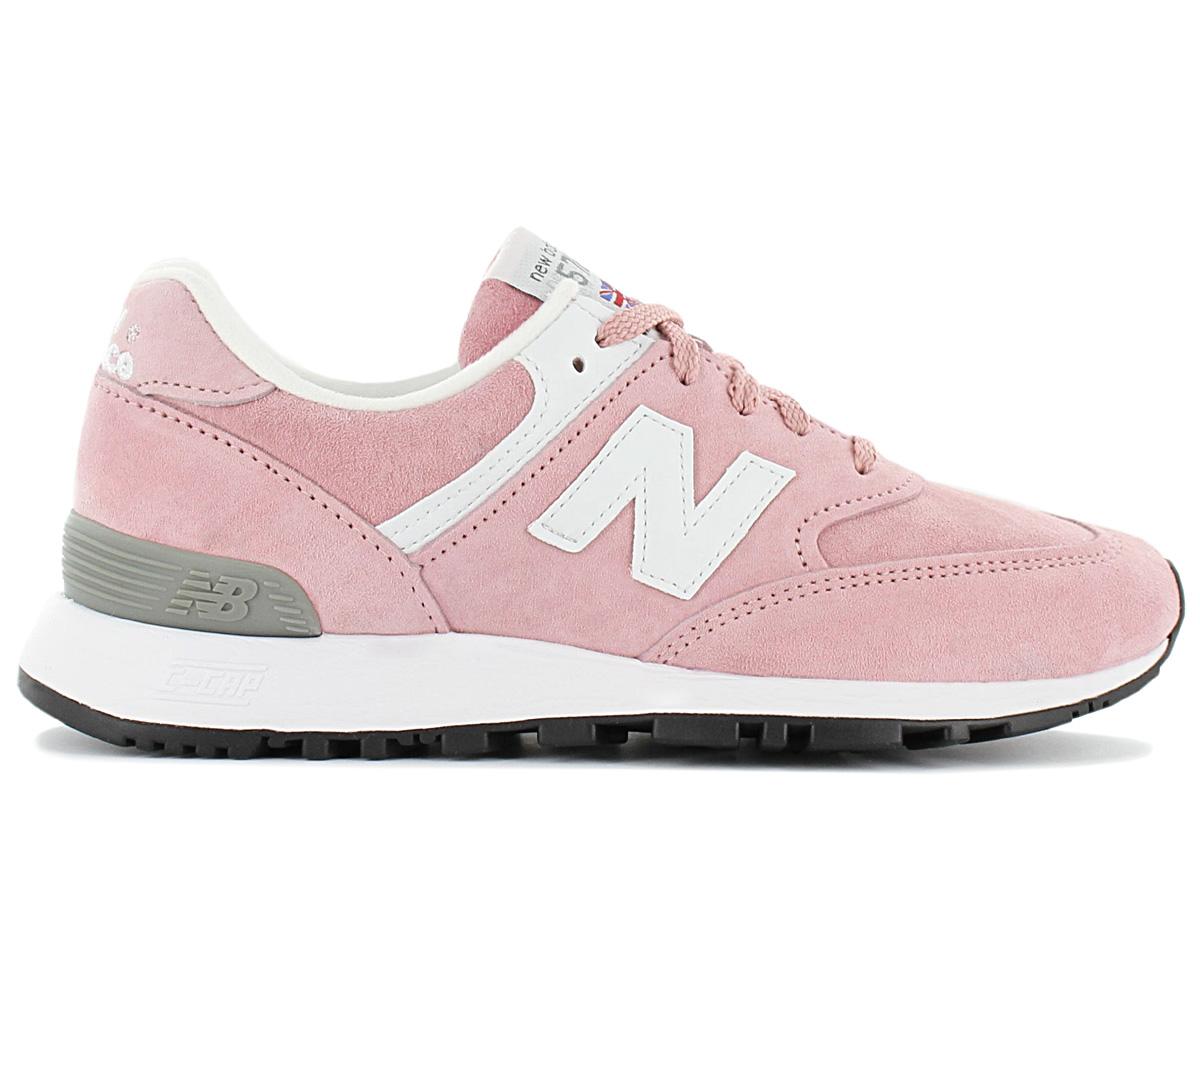 Details zu New Balance 576 - Made in England - W576PNK Damen Sneaker Leder  Schuhe Freizeit